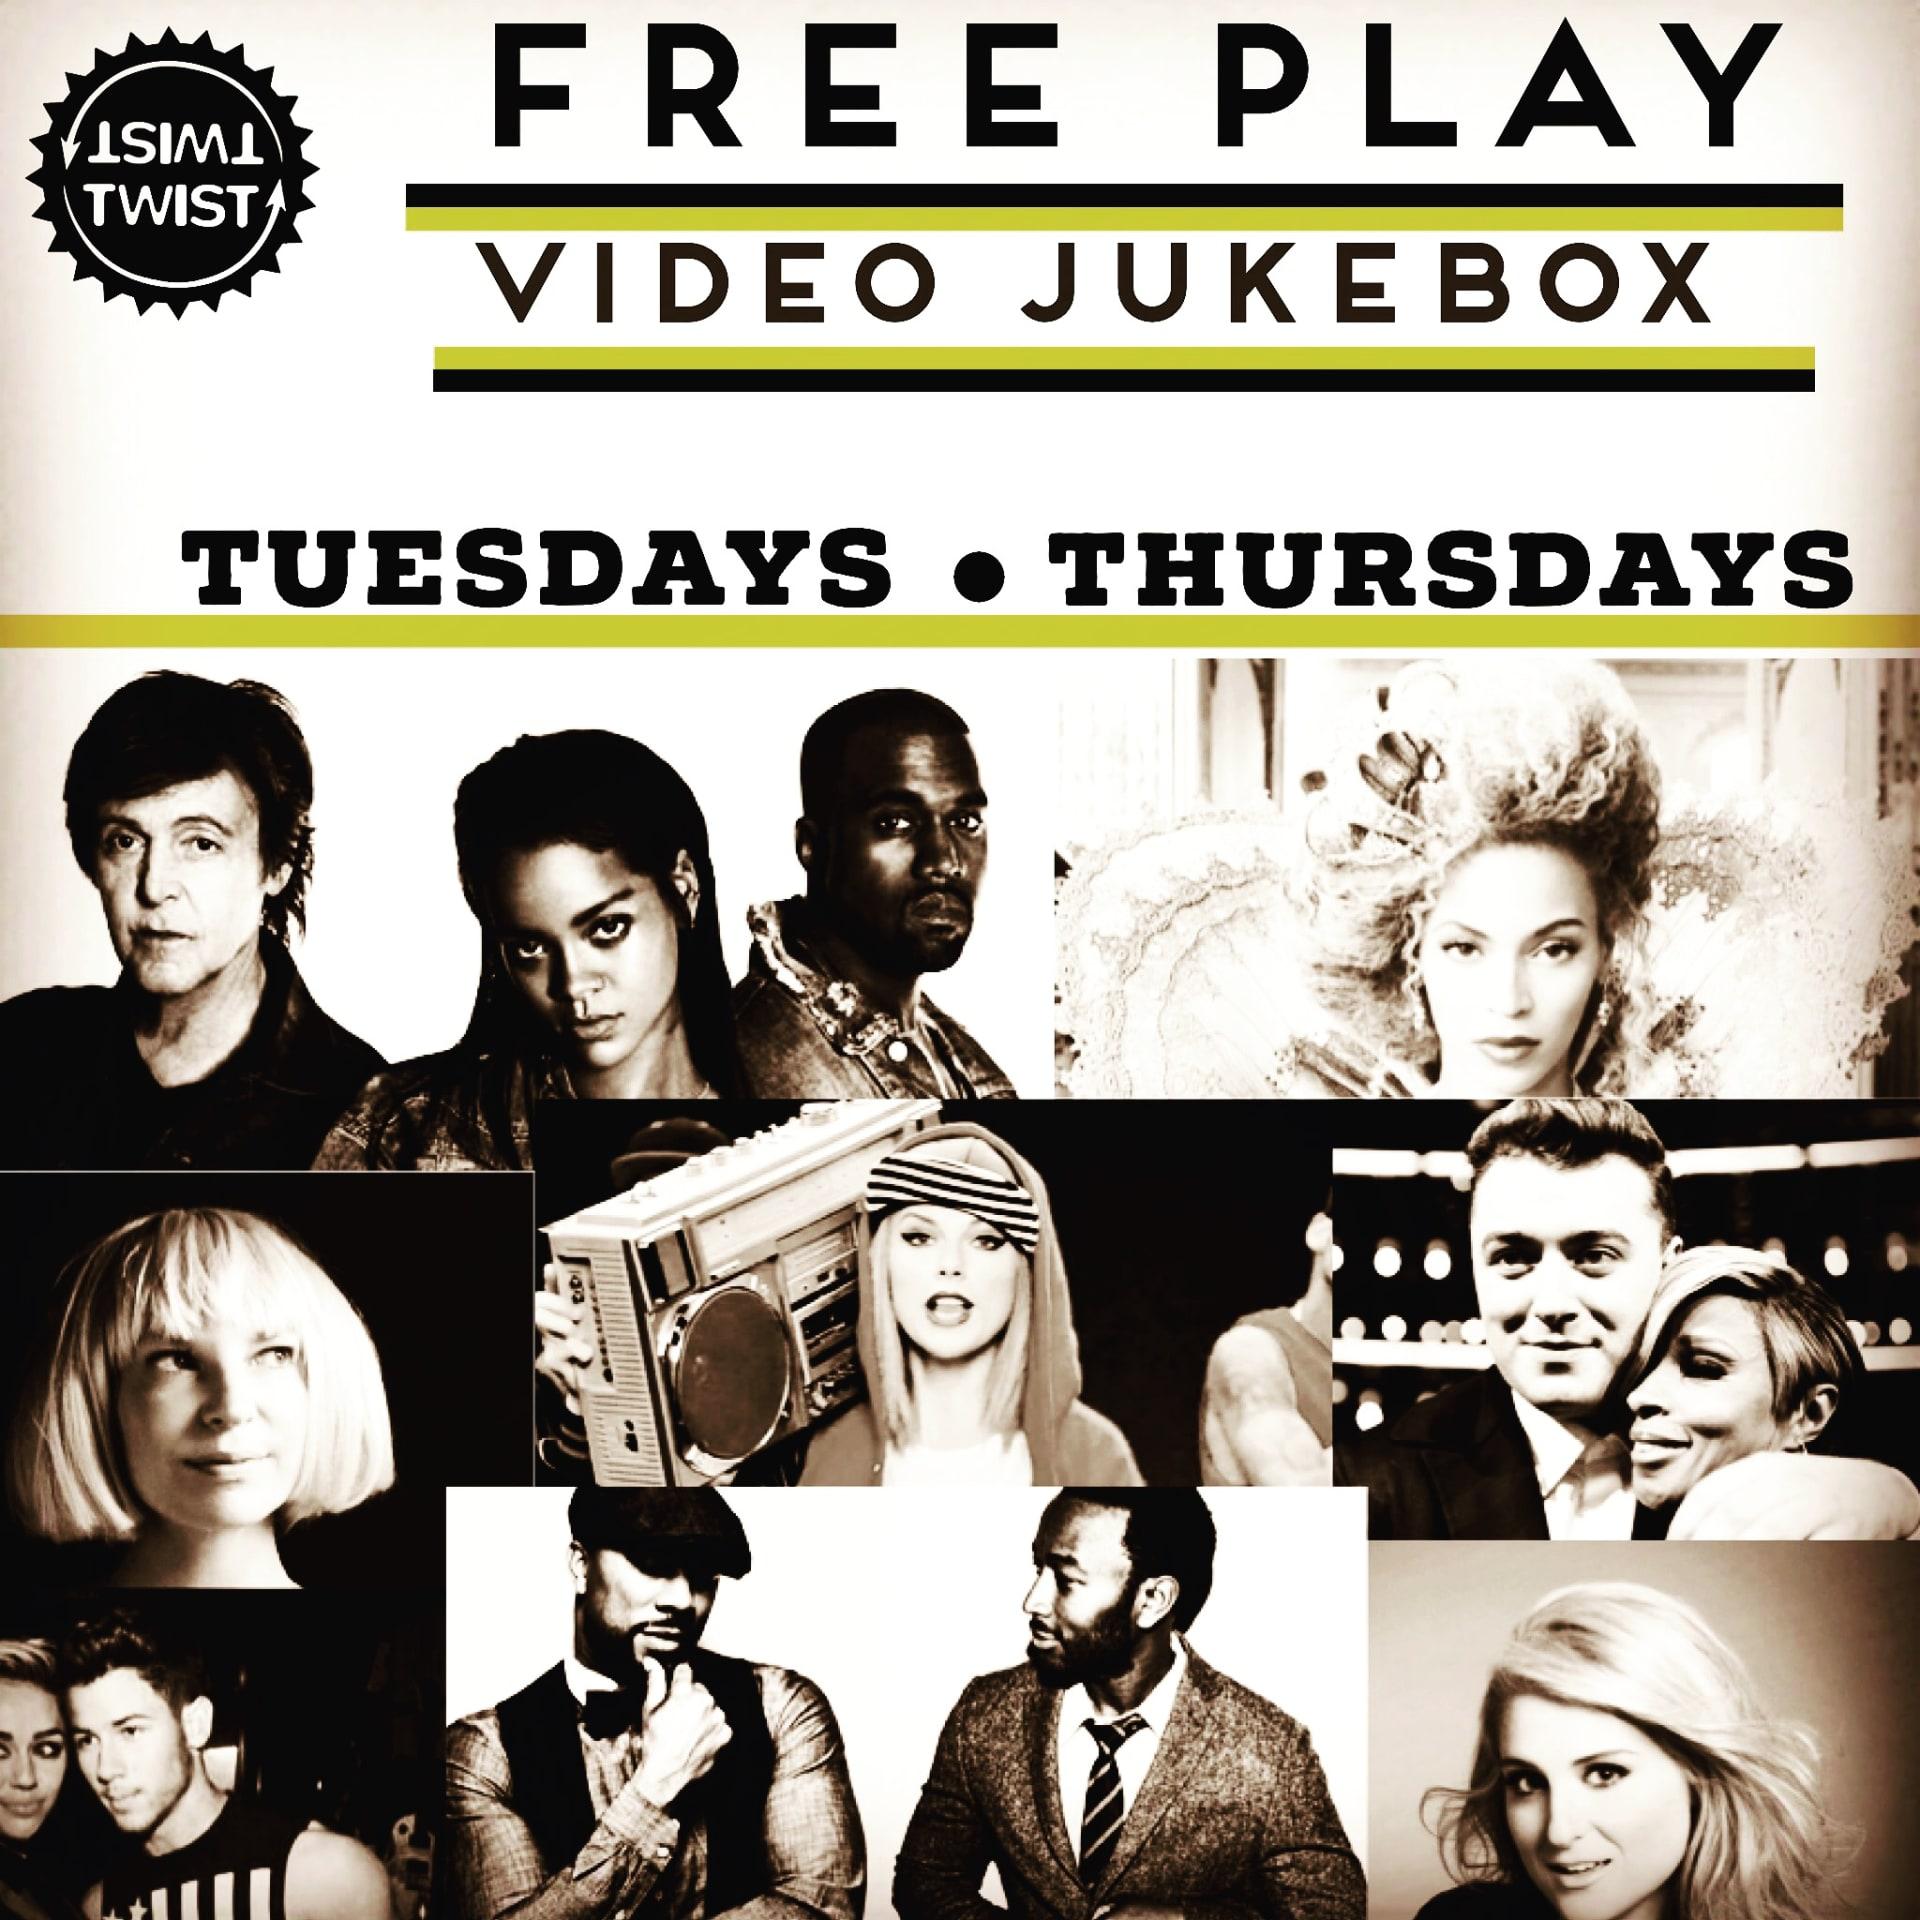 Tuesday & Thursday - Free Video Jukebox